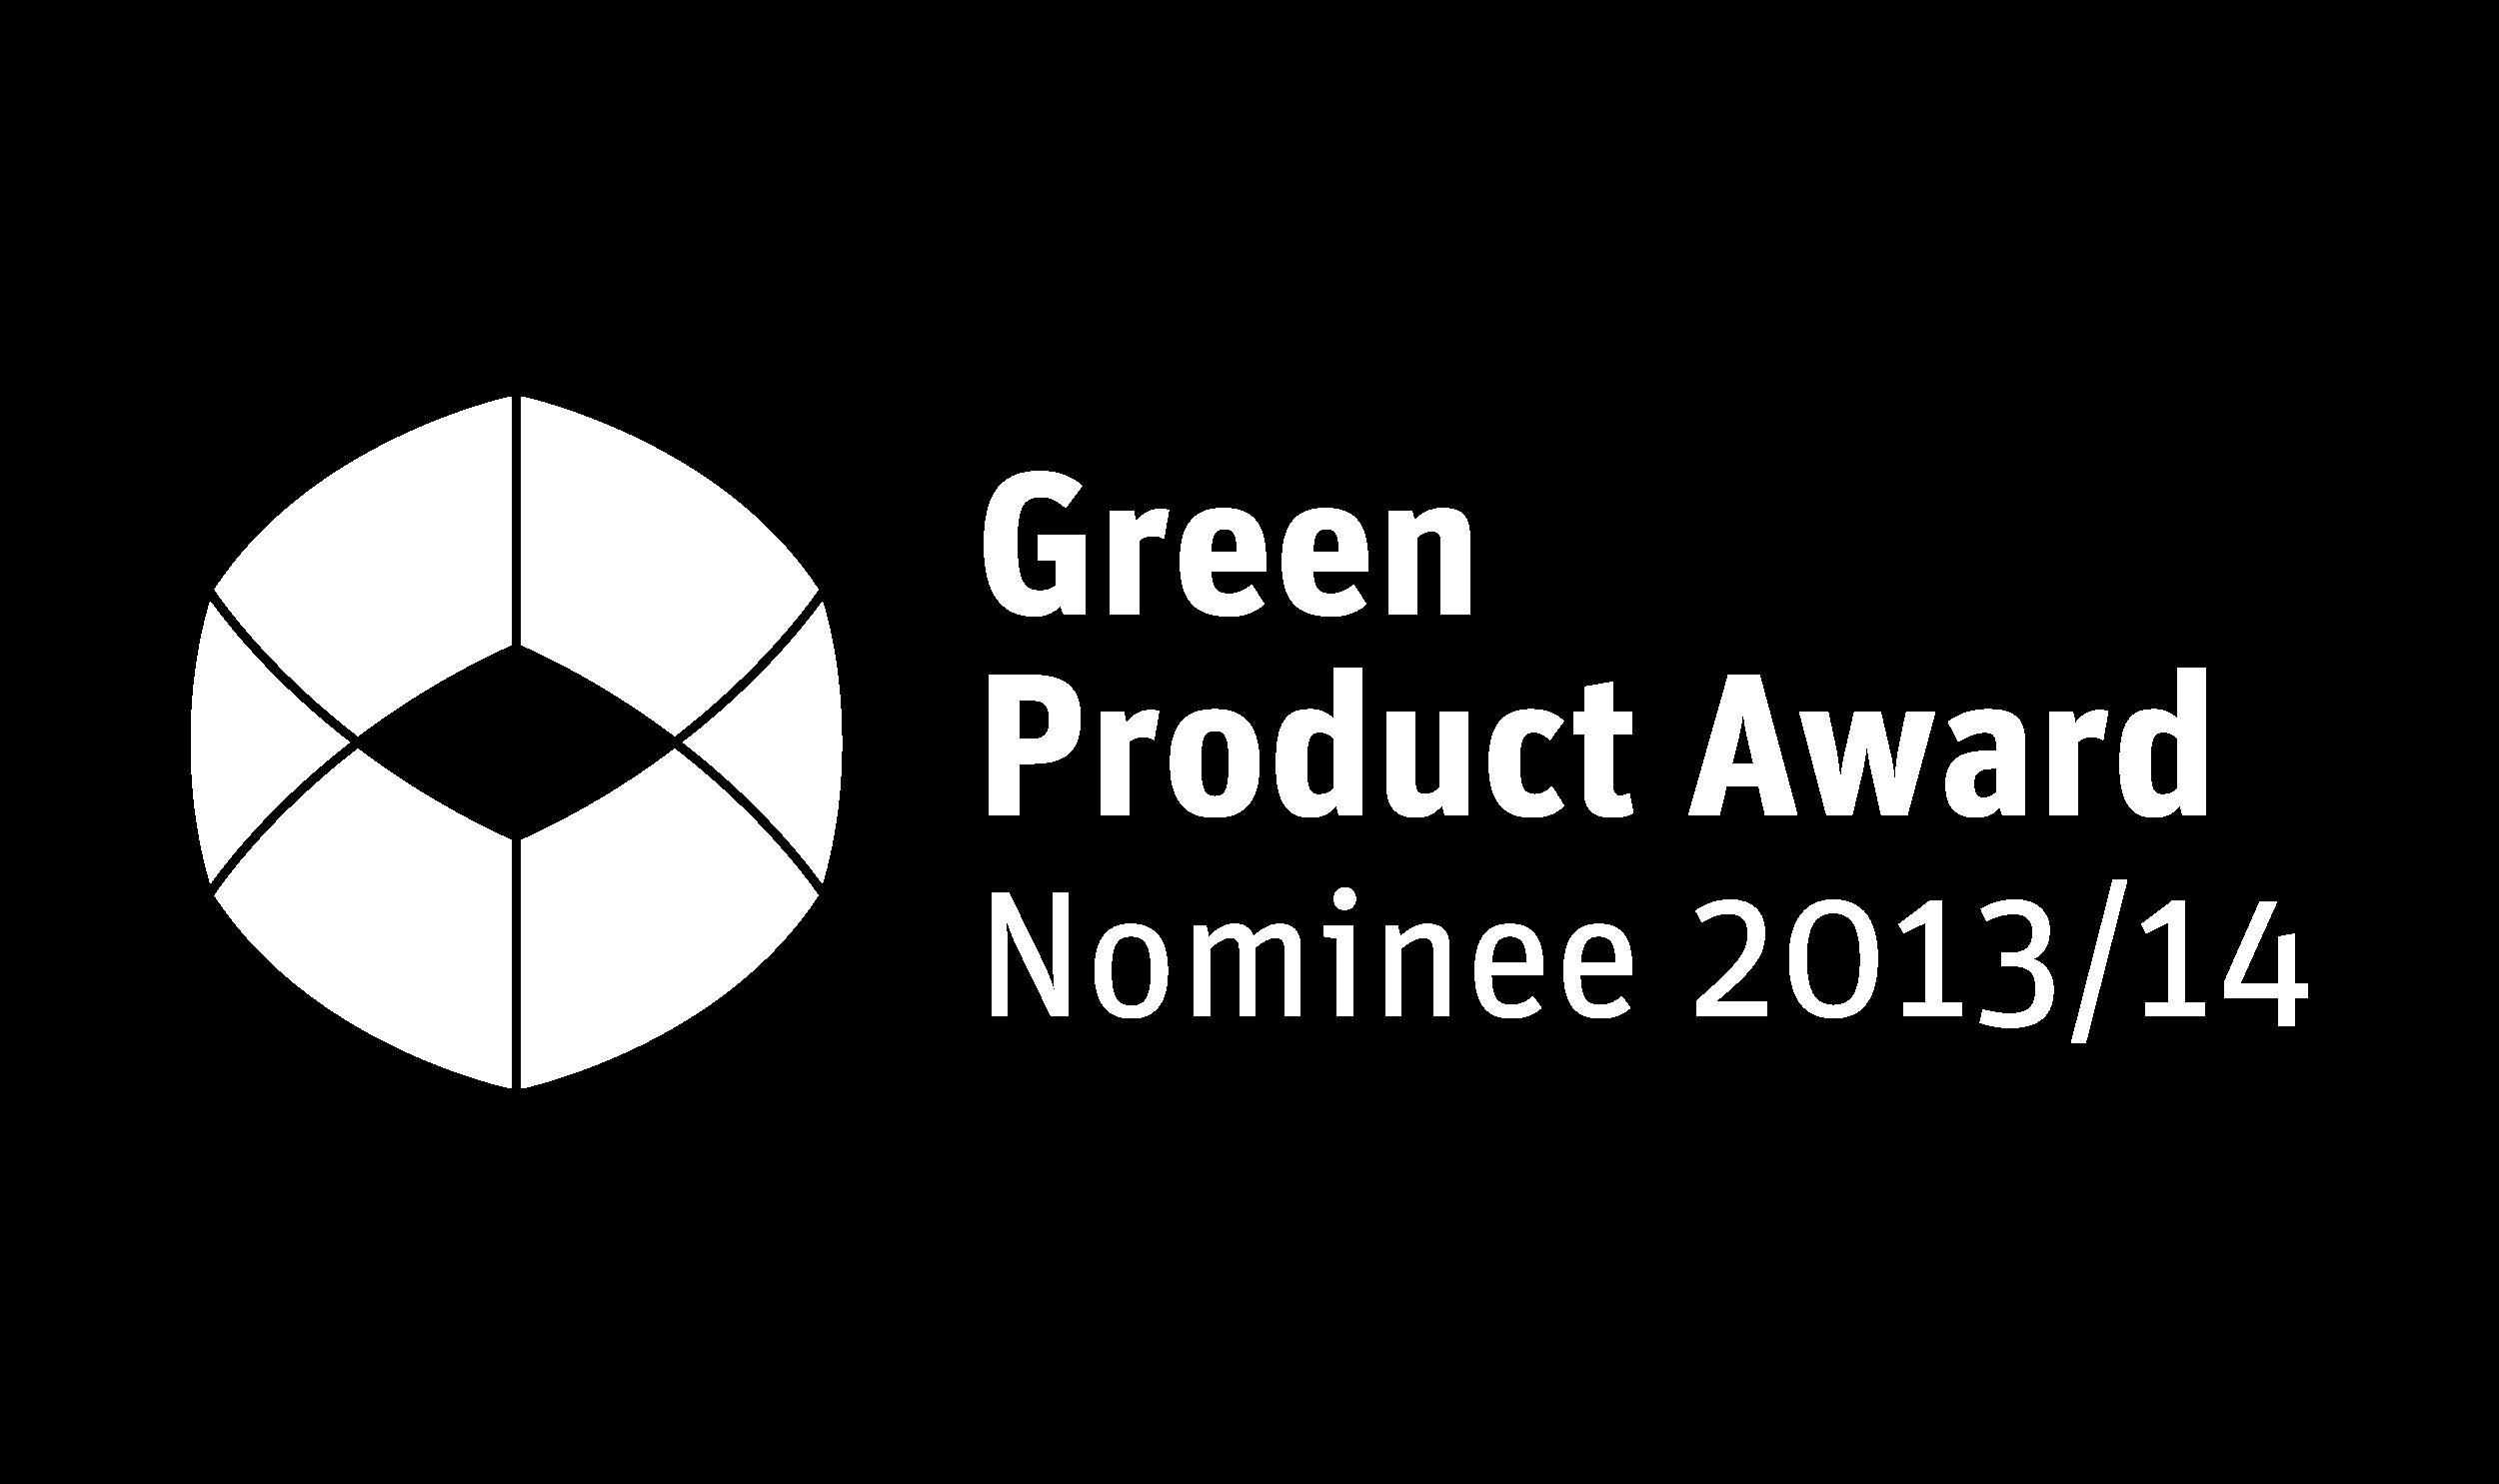 Green_Product_Award_Nominee_2014